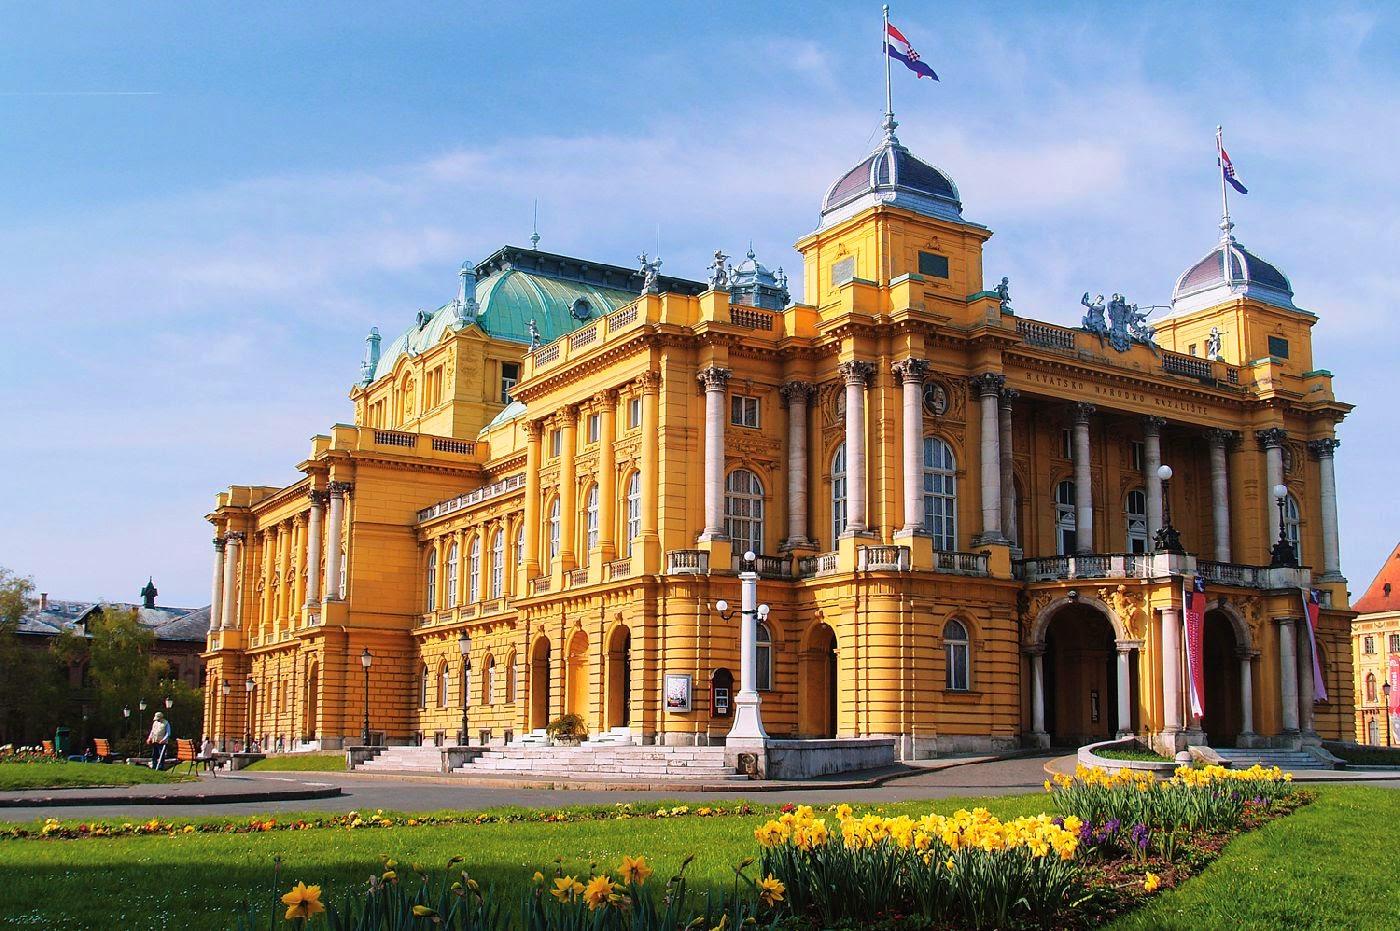 Hnk in Zagreb